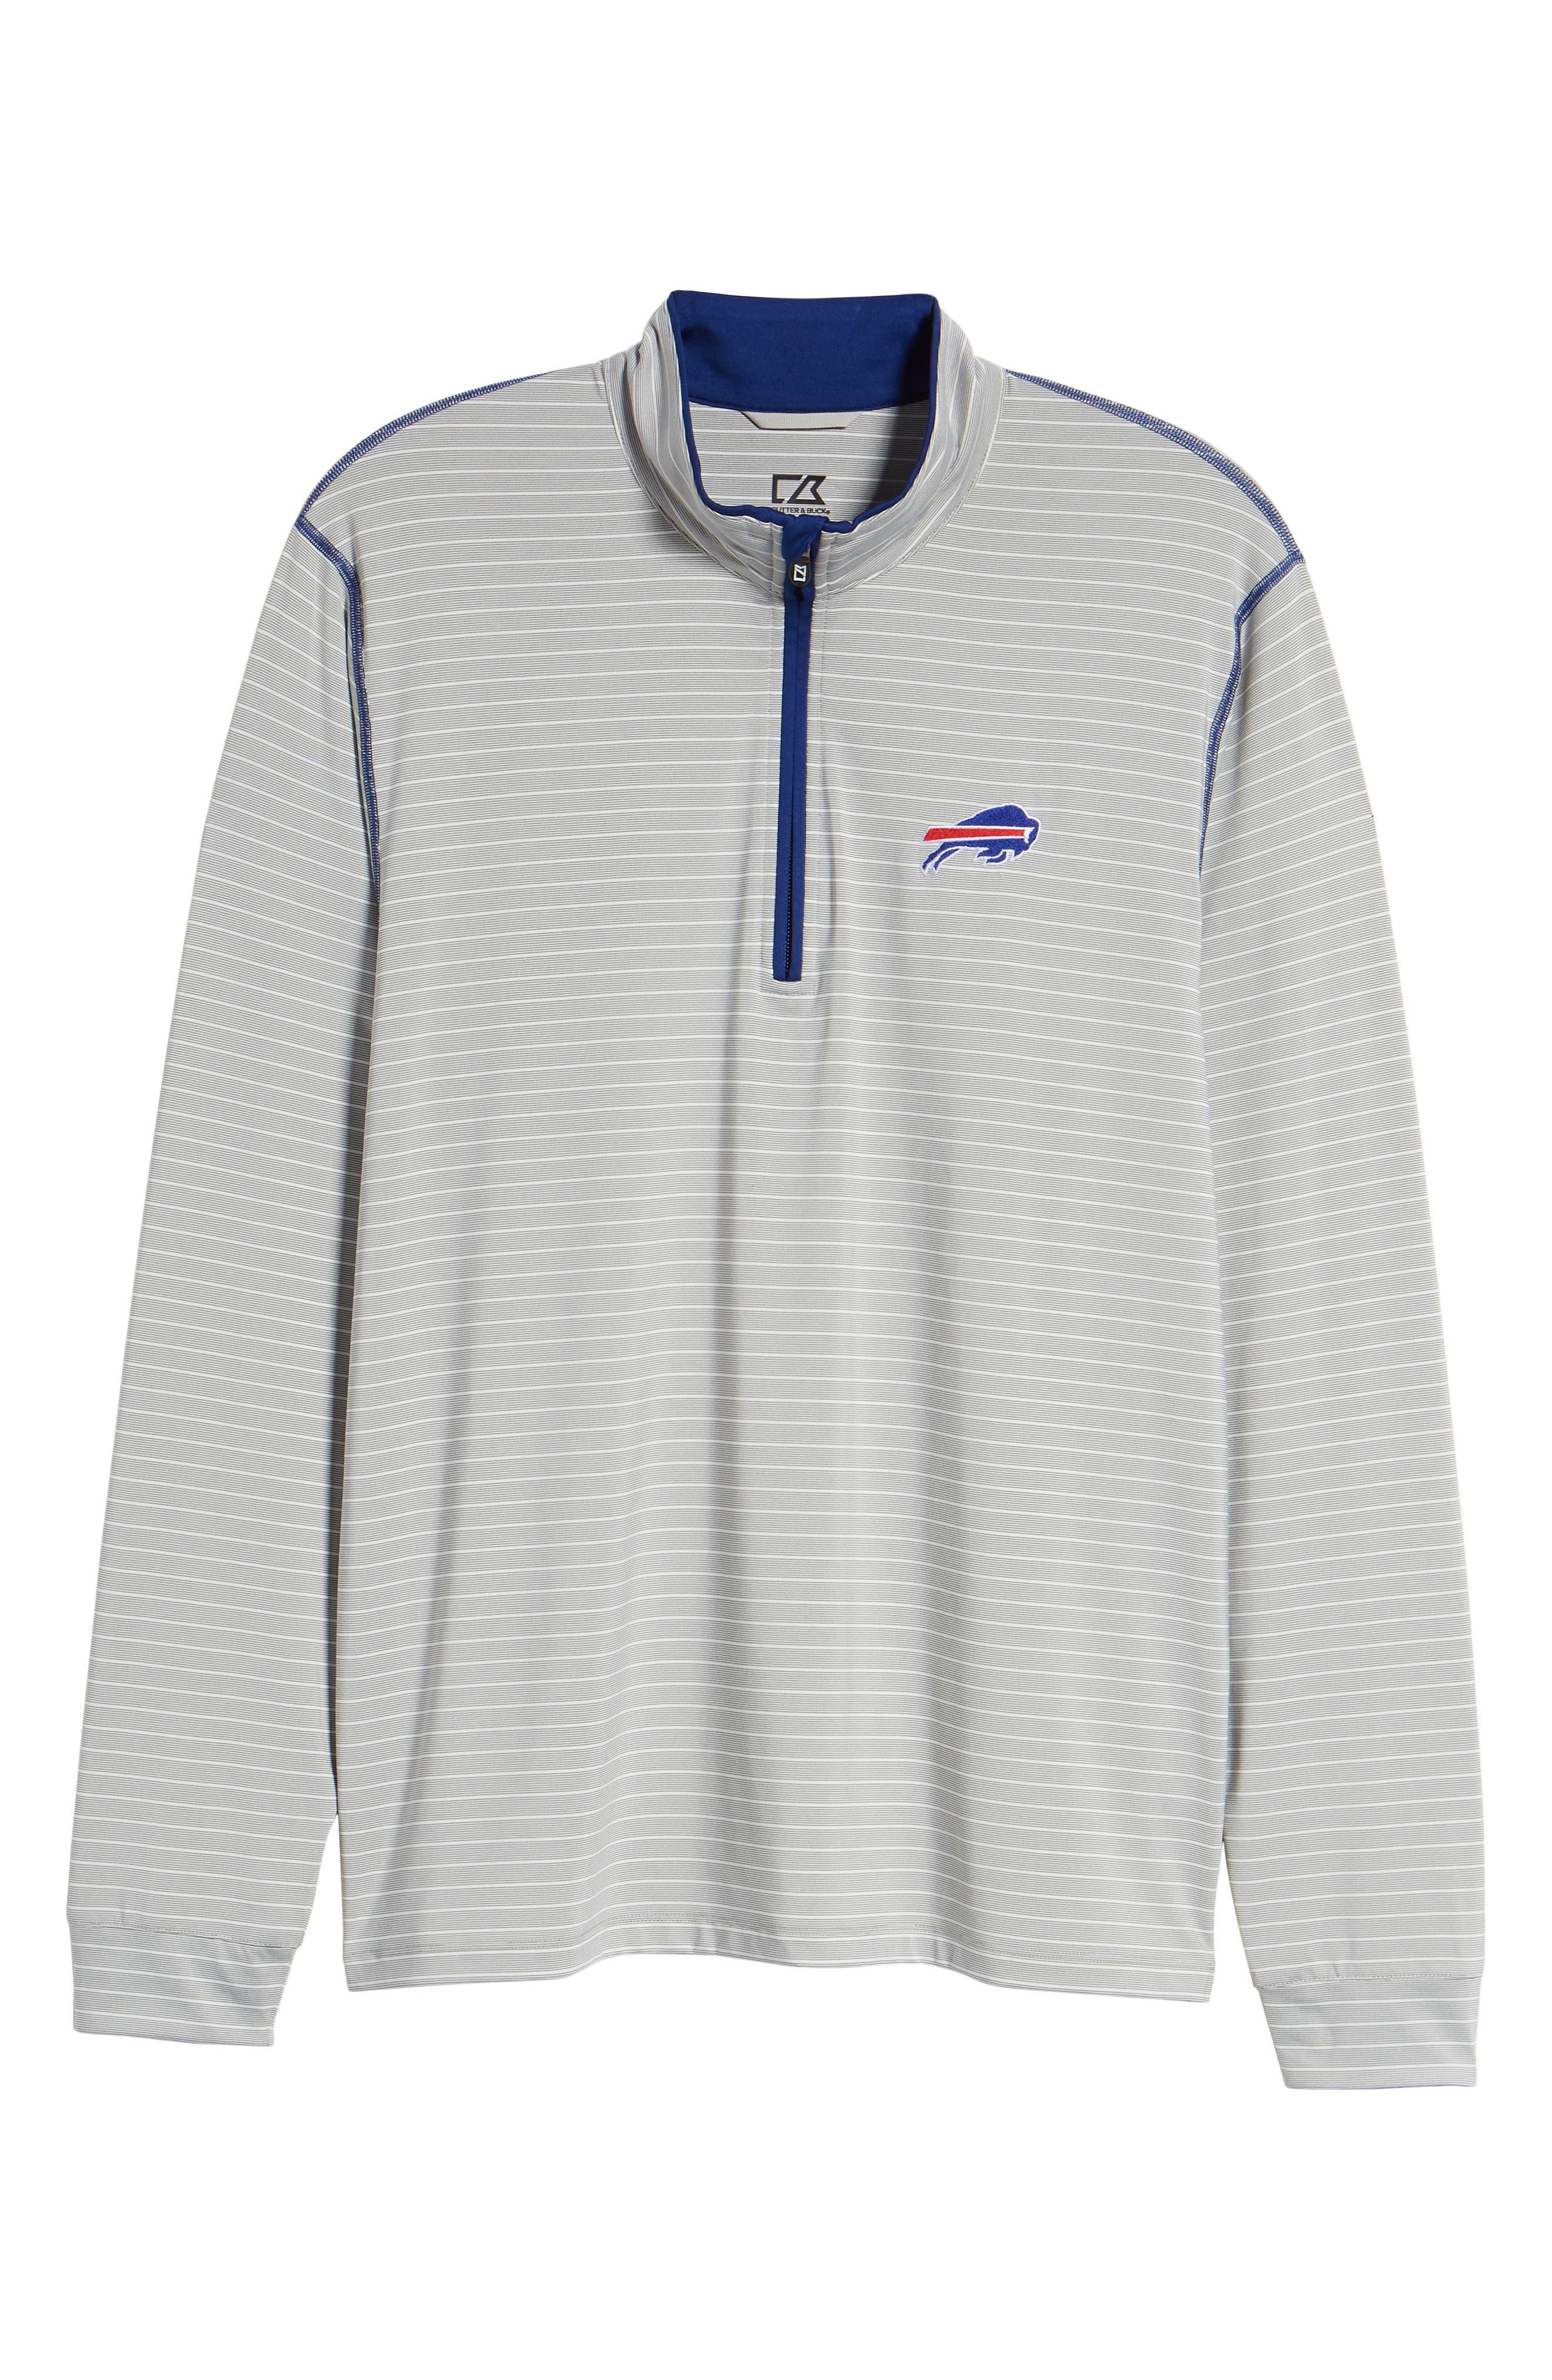 Meridian - Buffalo Bills Regular Fit Half Zip Pullover,                             Alternate thumbnail 6, color,                             462